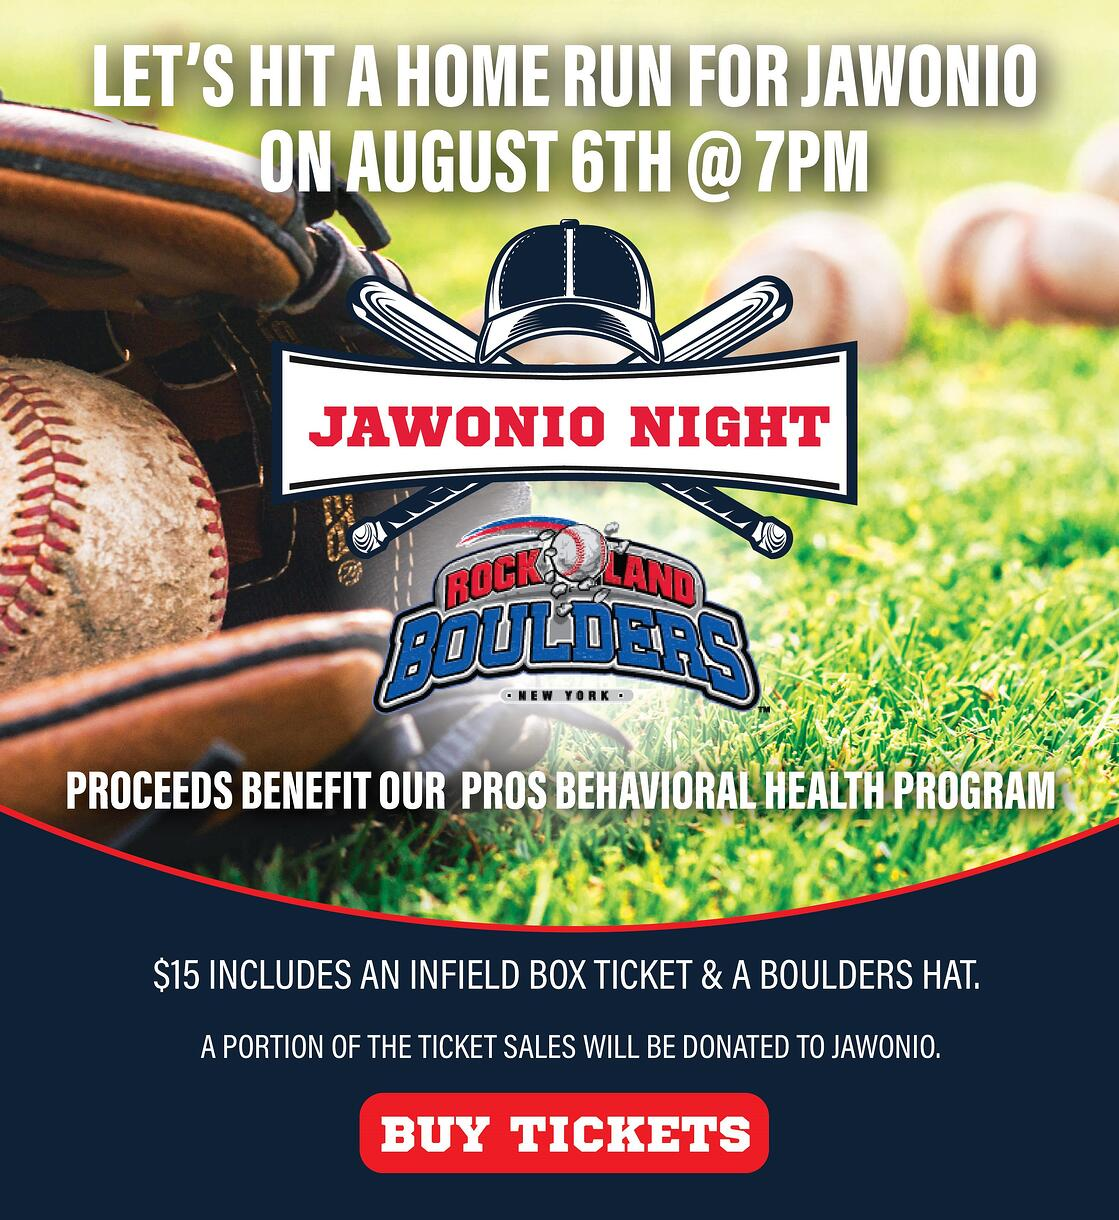 Jawonio Night at Rockland Boulders at Provident Bank Park